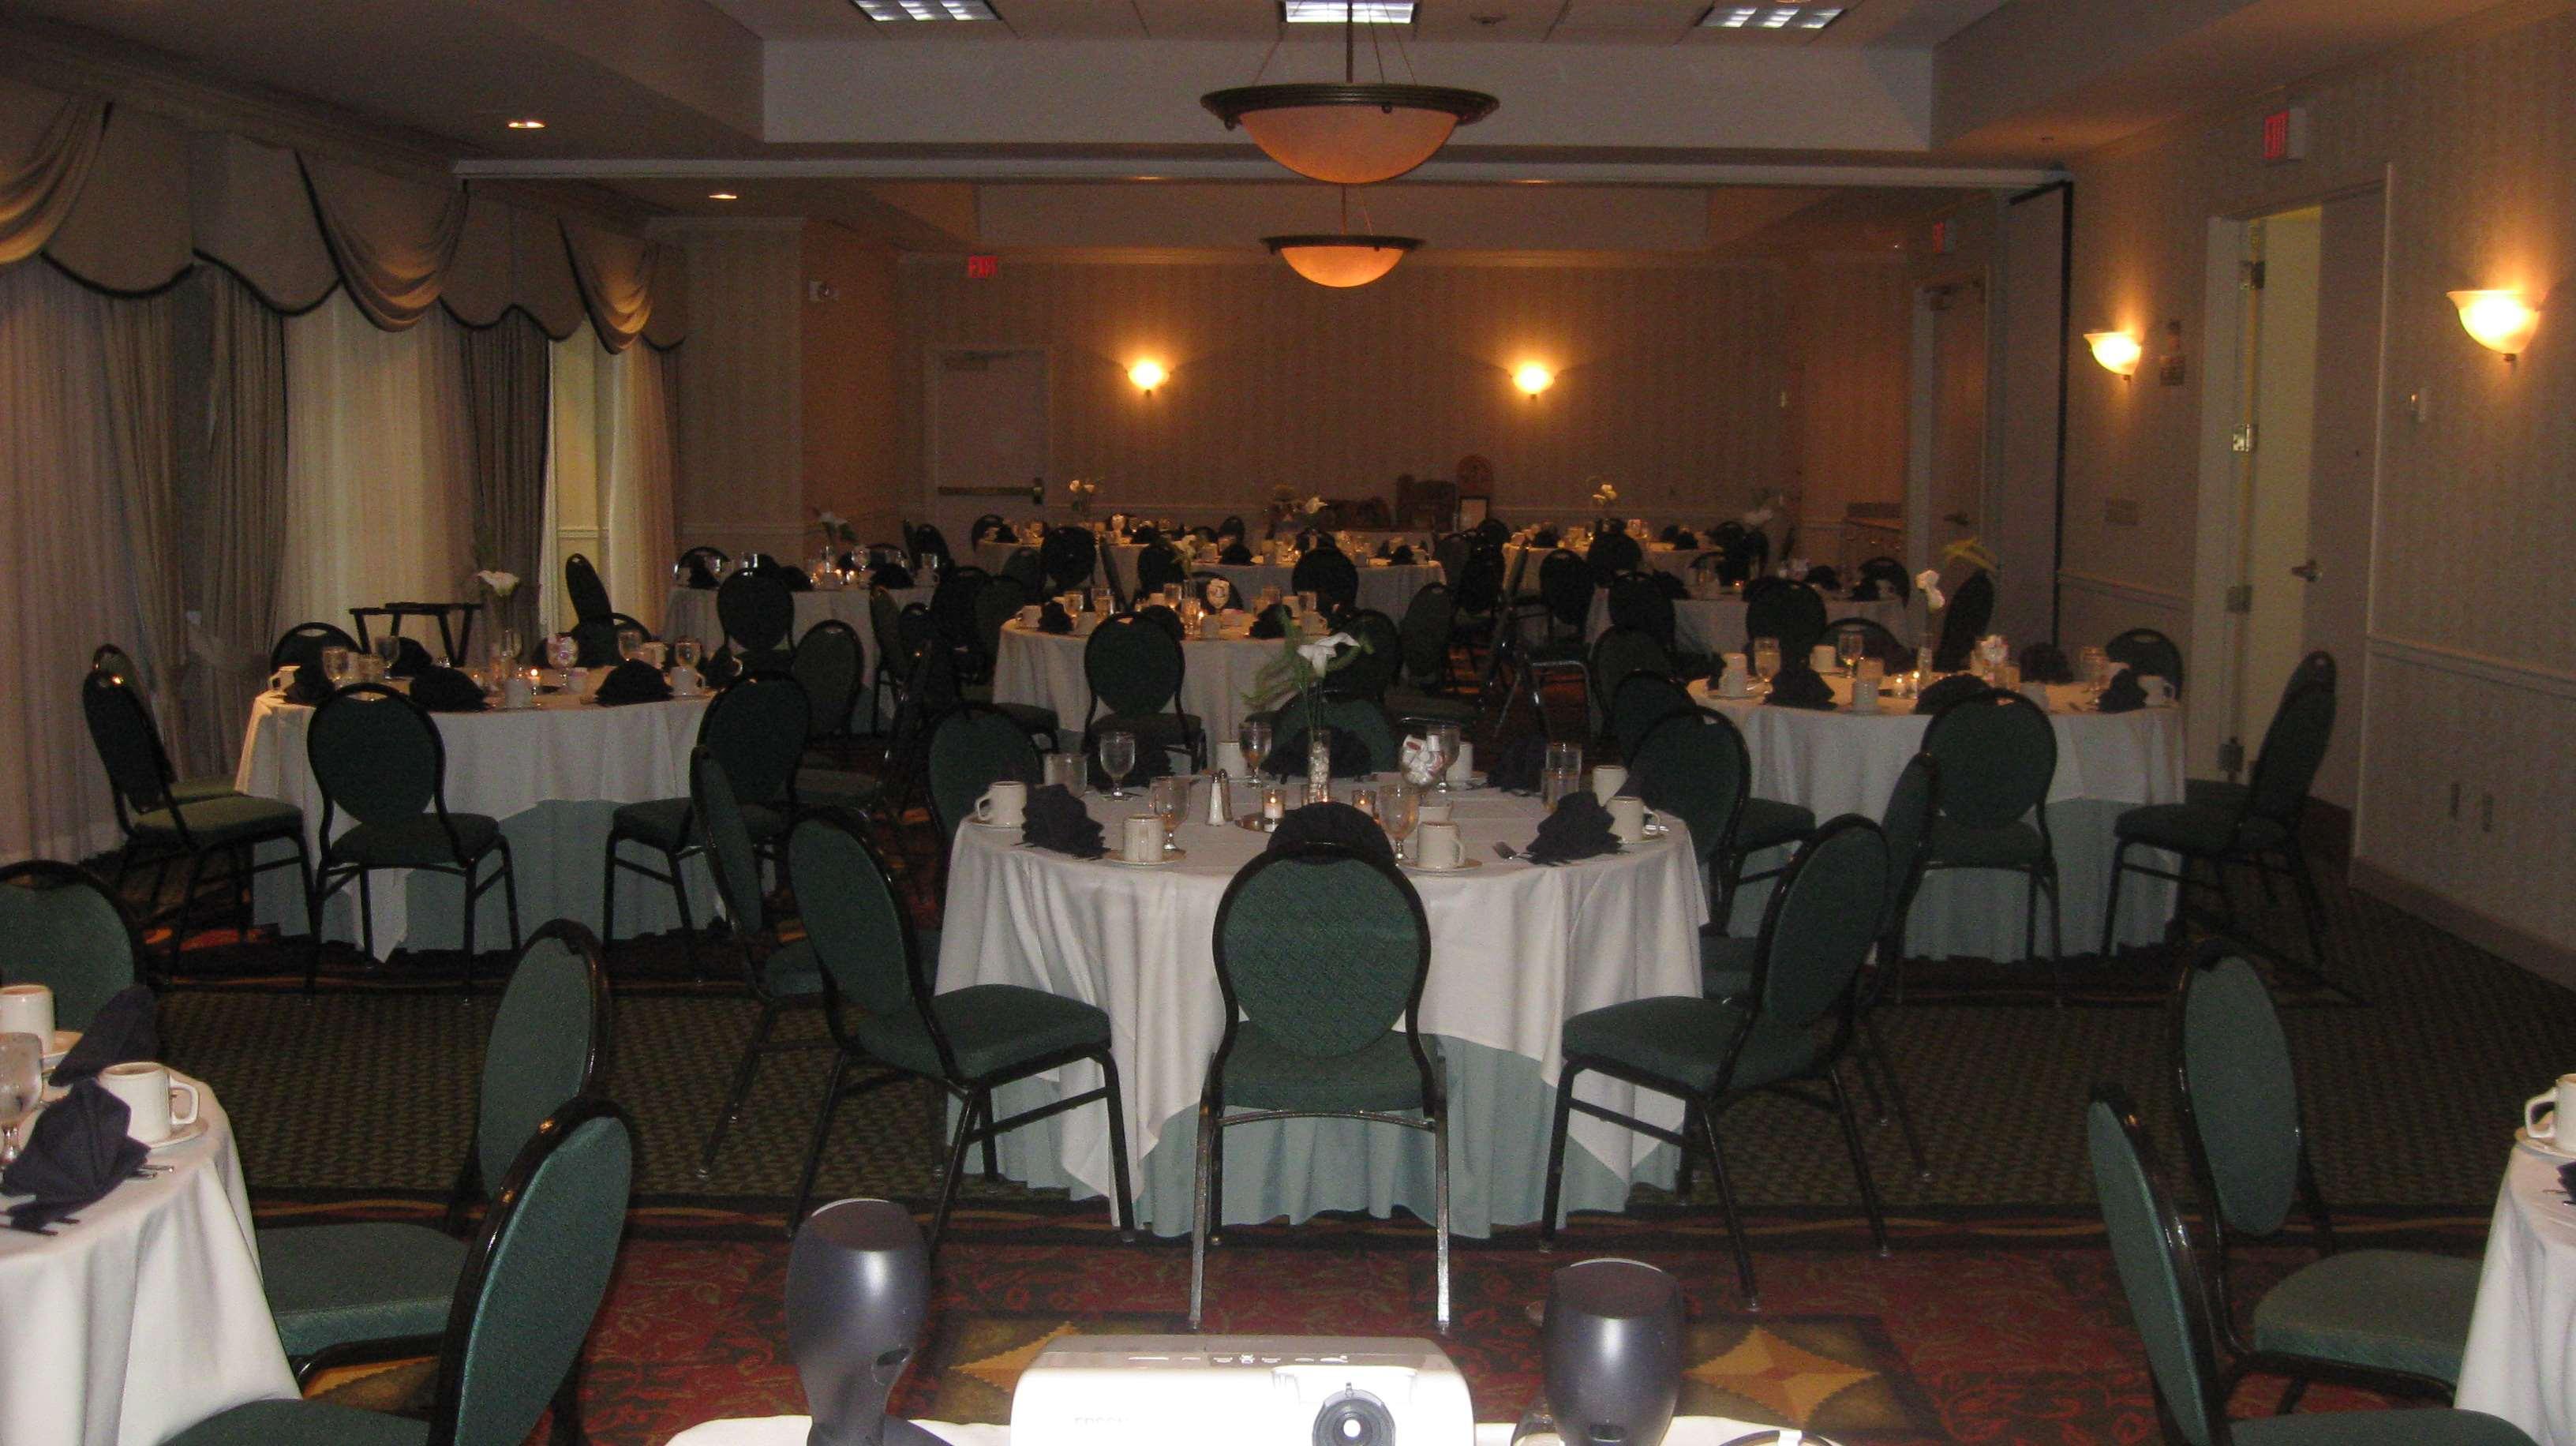 Hilton Garden Inn Elmira/Corning image 34